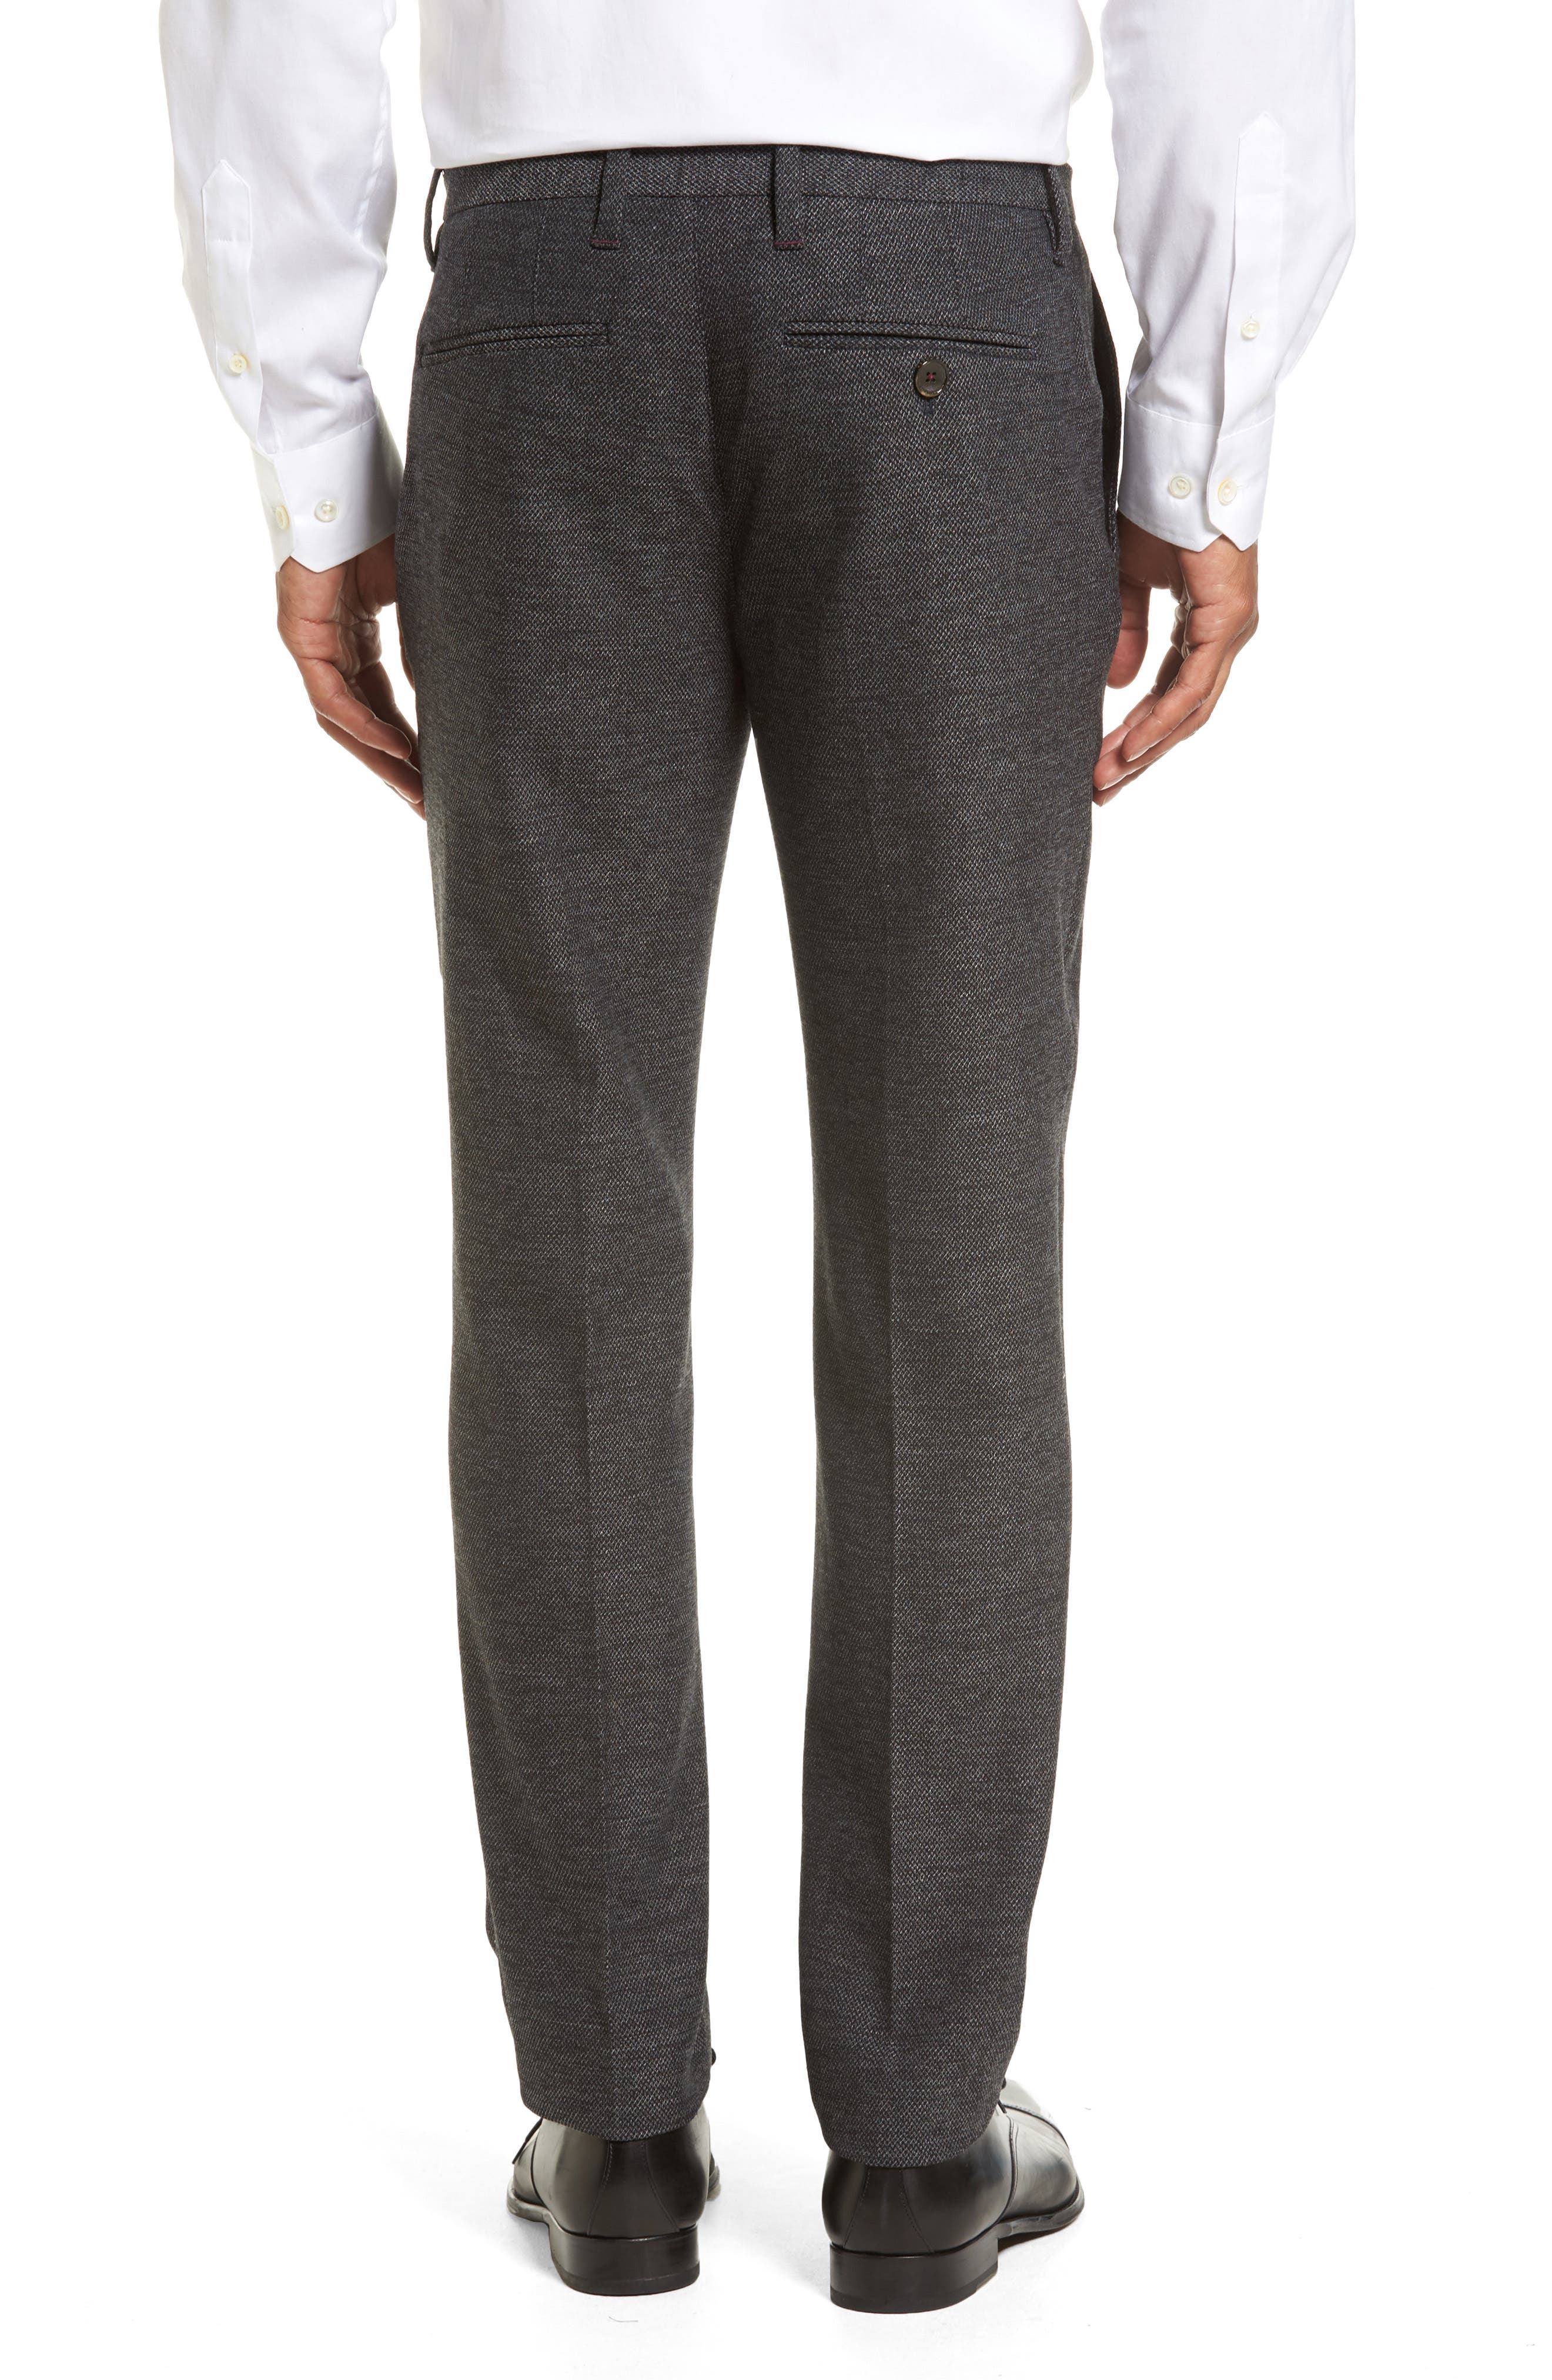 Porttro Modern Slim Fit Trousers,                             Alternate thumbnail 3, color,                             010